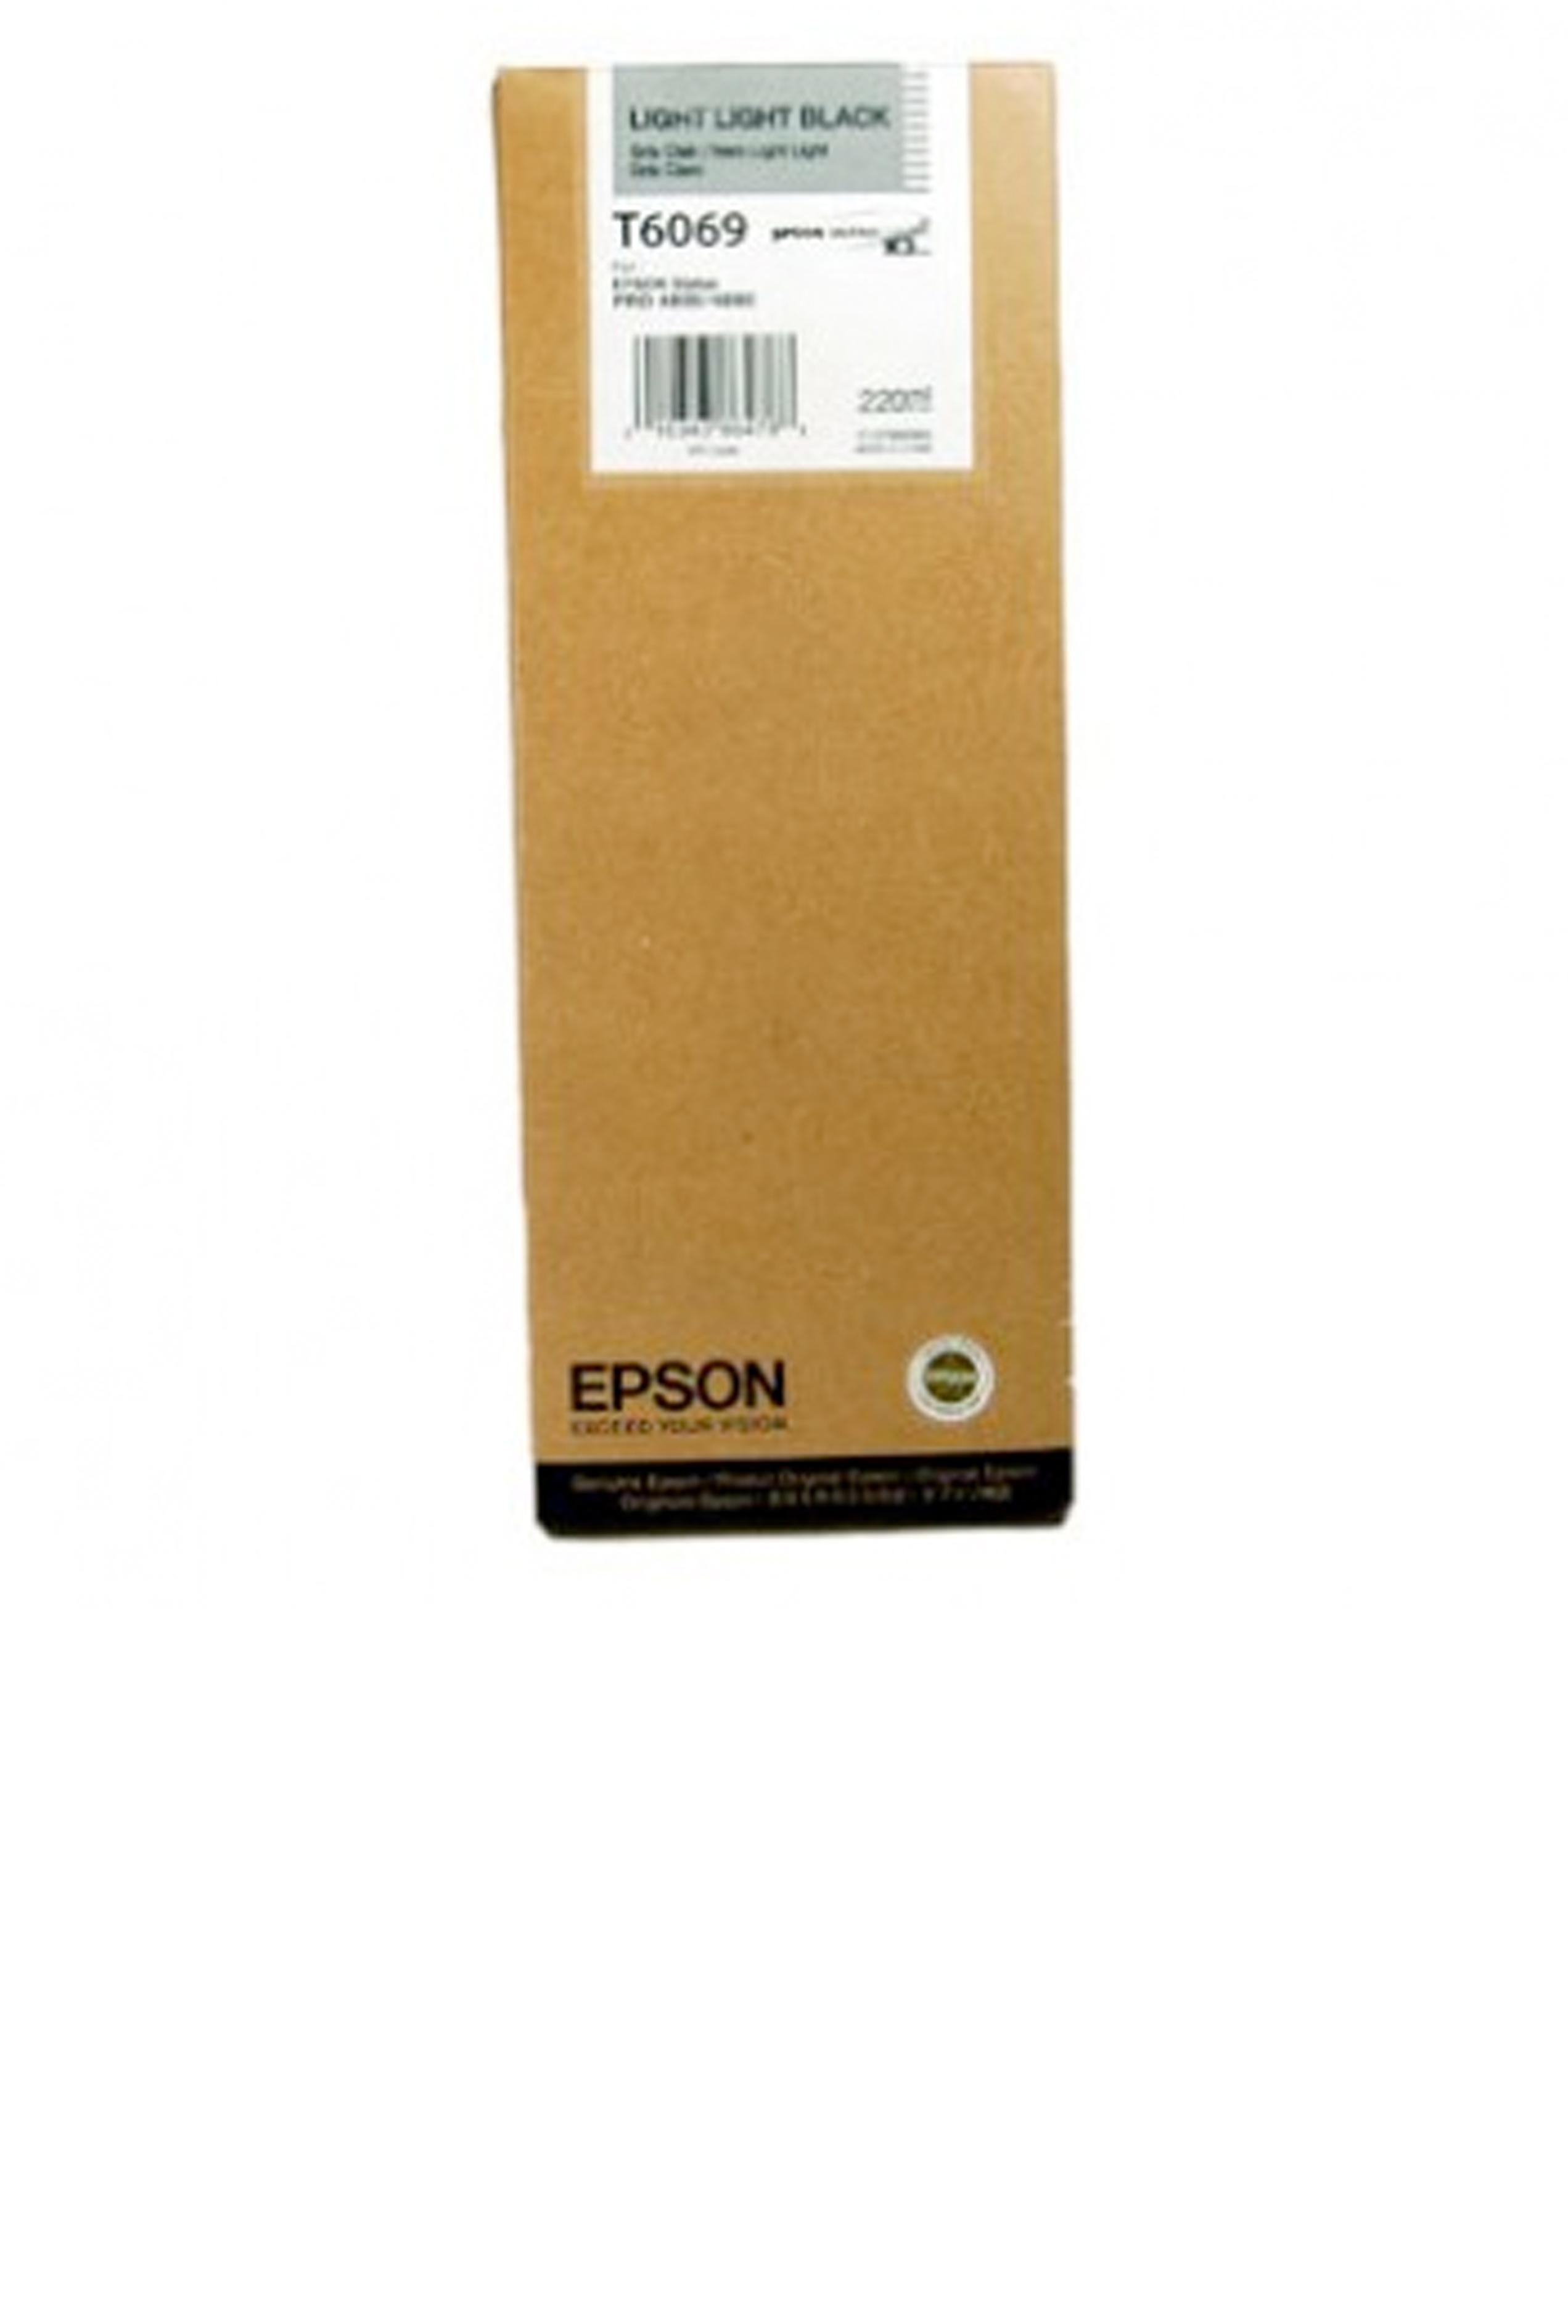 Epson EPSON HI LT BLACK INK (220 ML) (T606900)